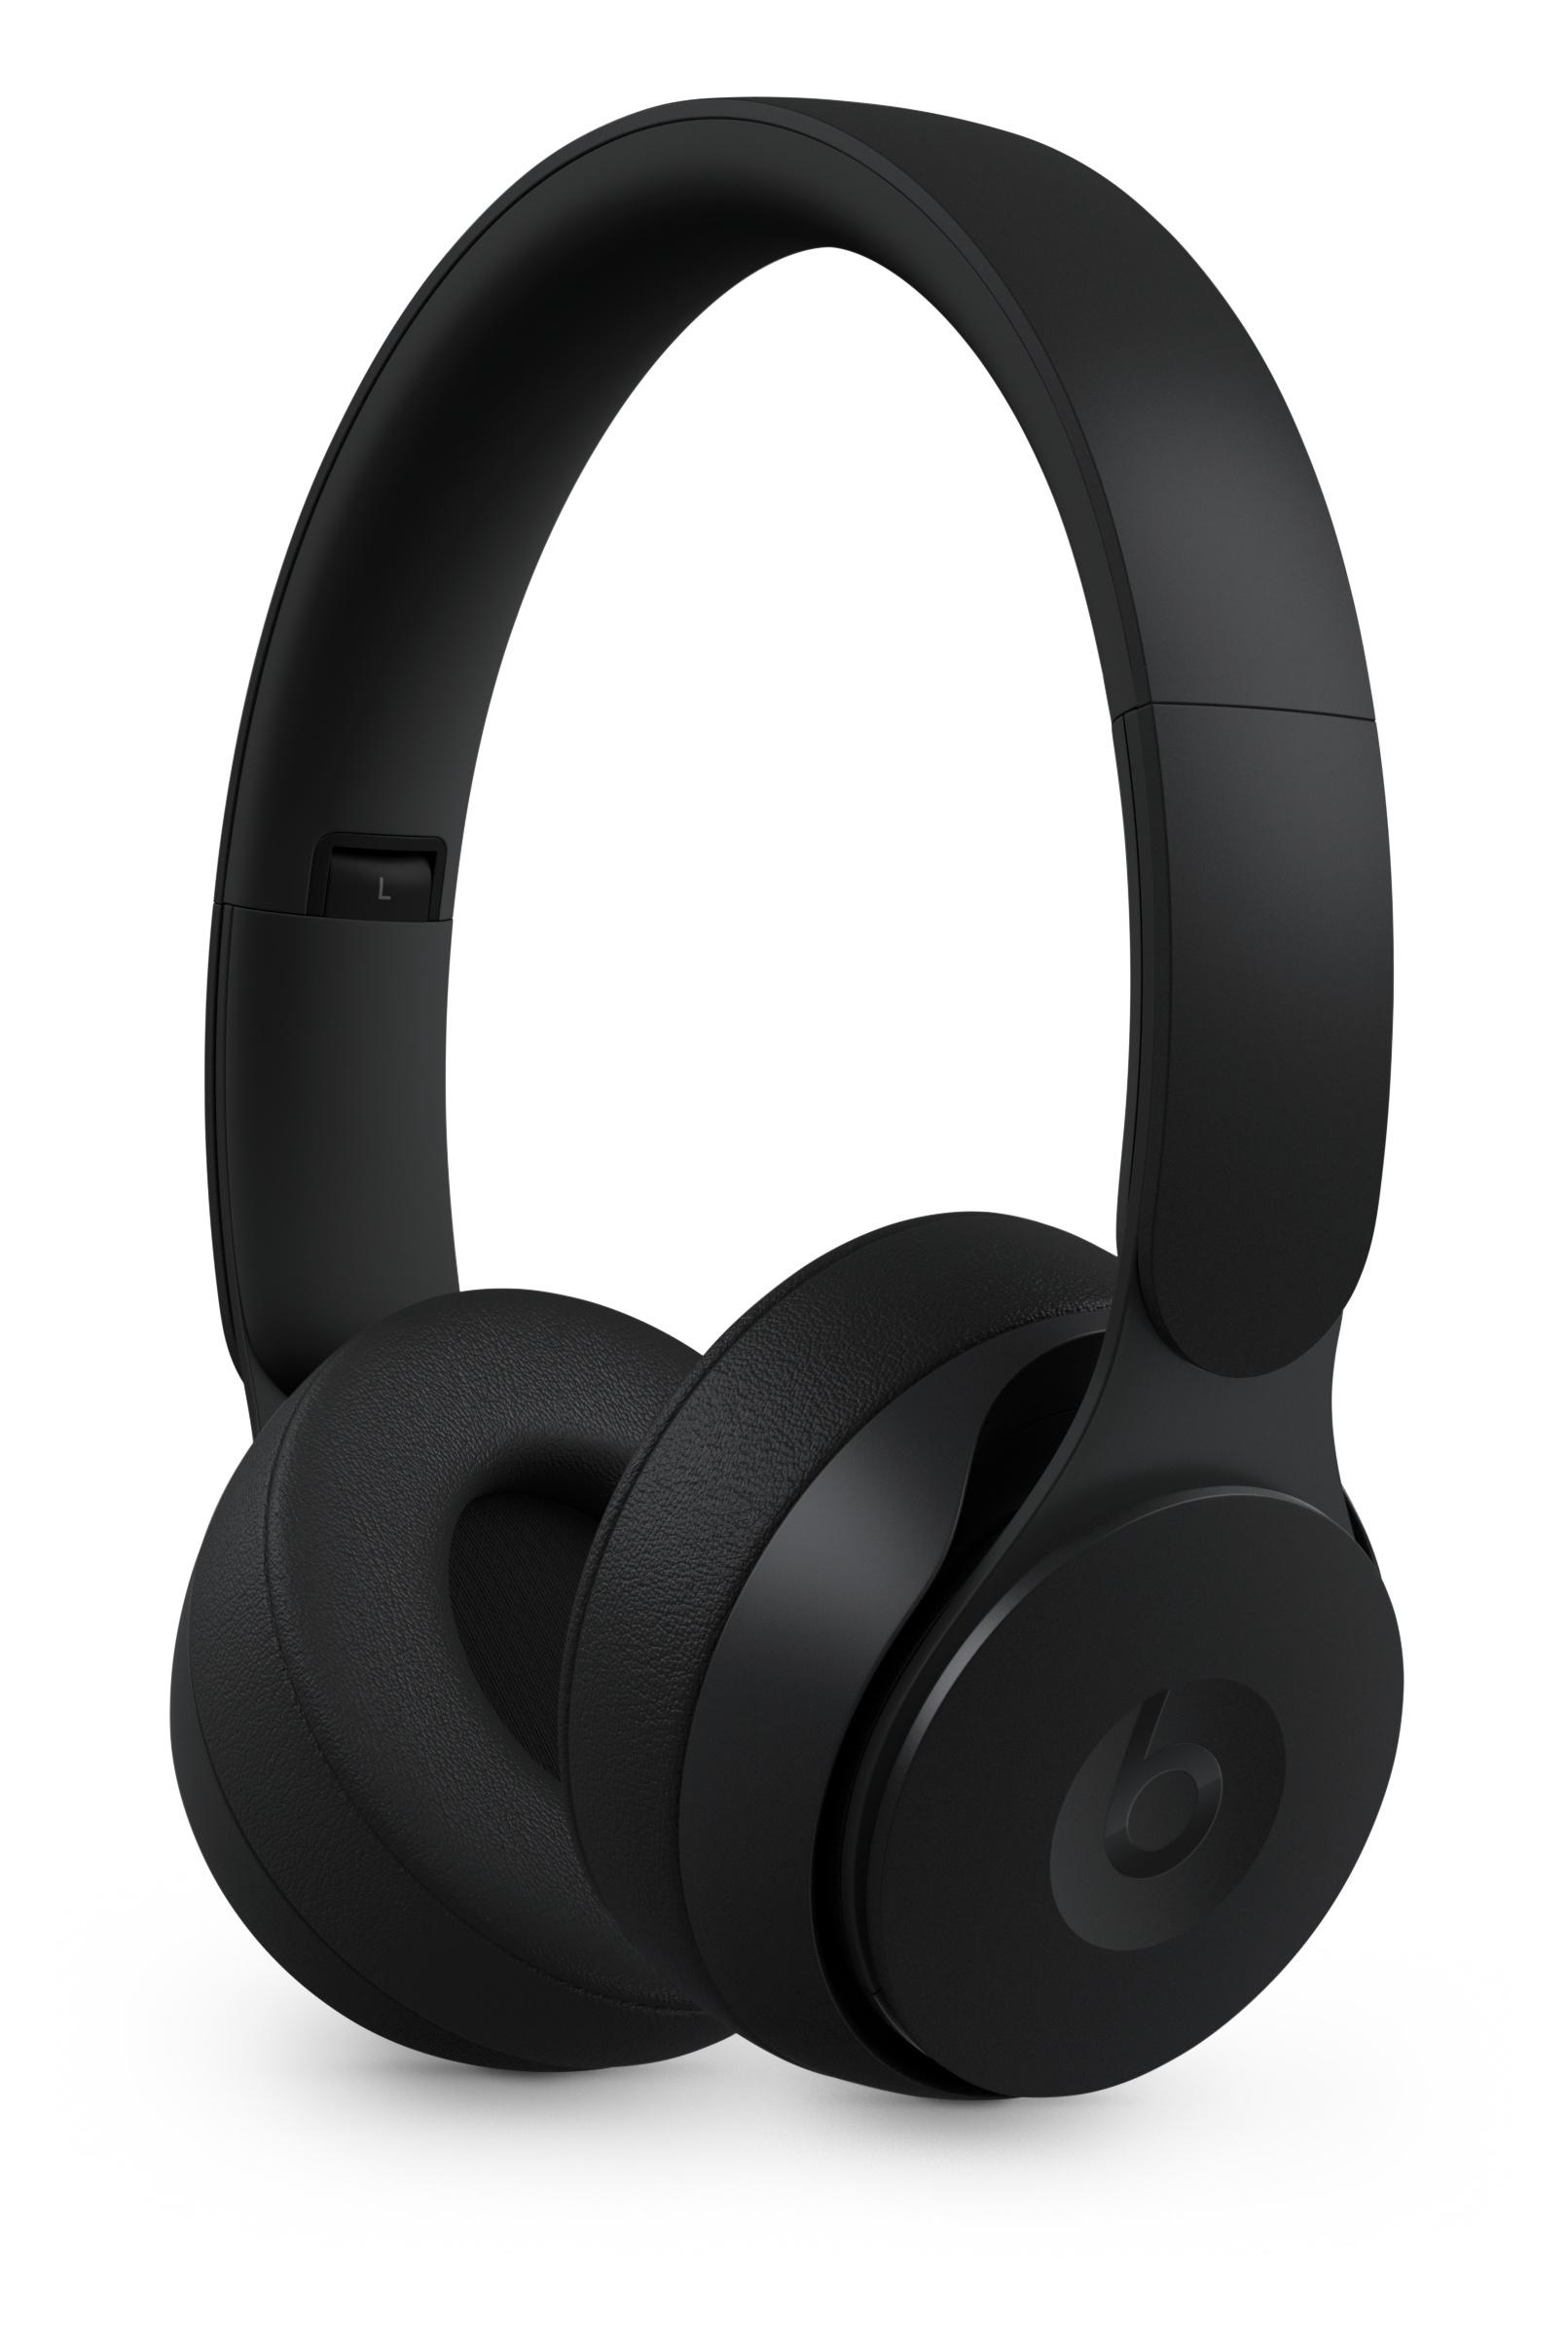 Beats Solo Pro Wireless Noise Cancelling Headphones Black Apple